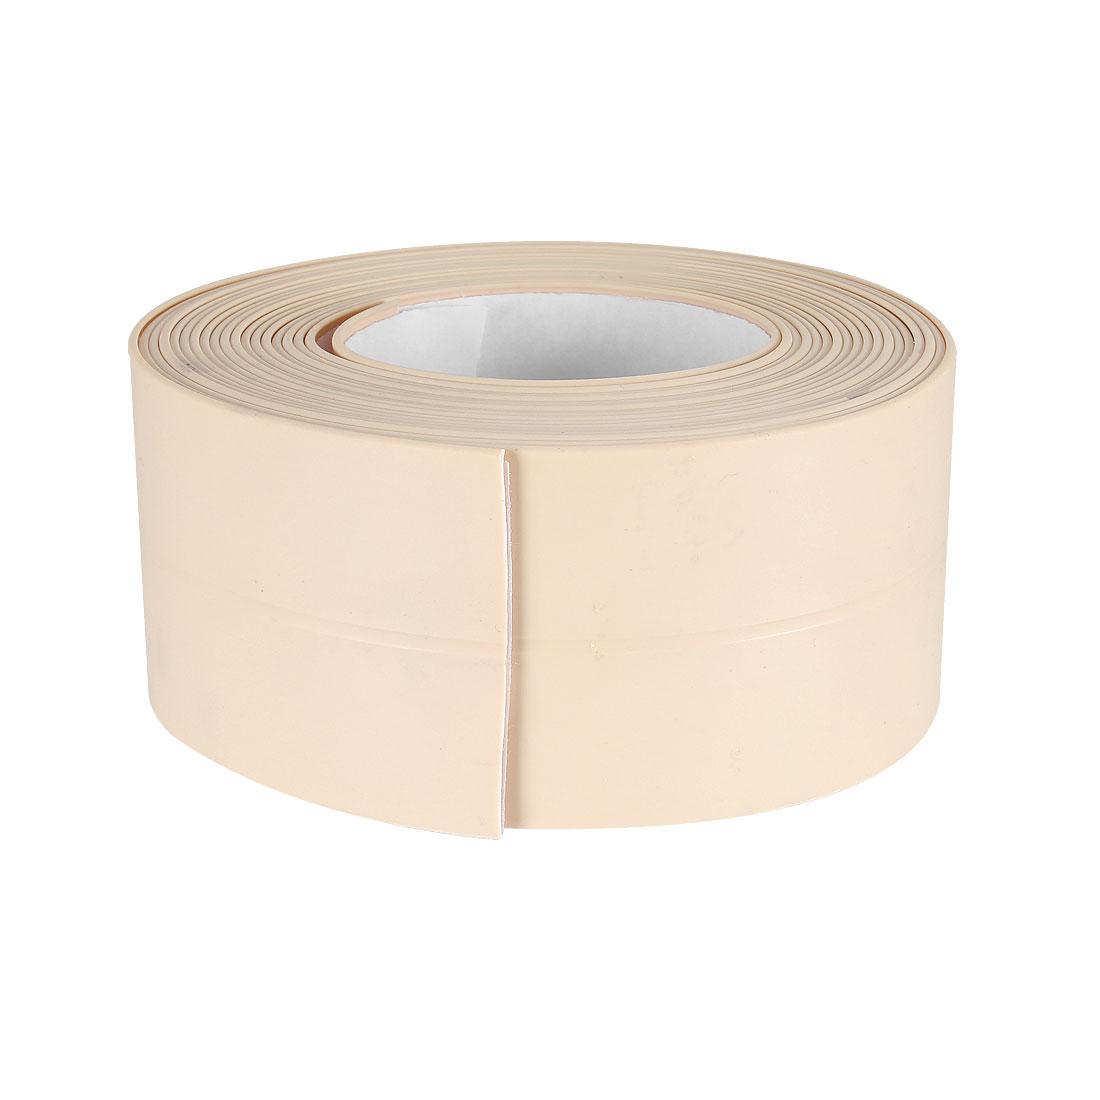 Caulk Strip Flexible Self Adhesive Tape for Wall Sealing 10.5ftx38mm (Beige)